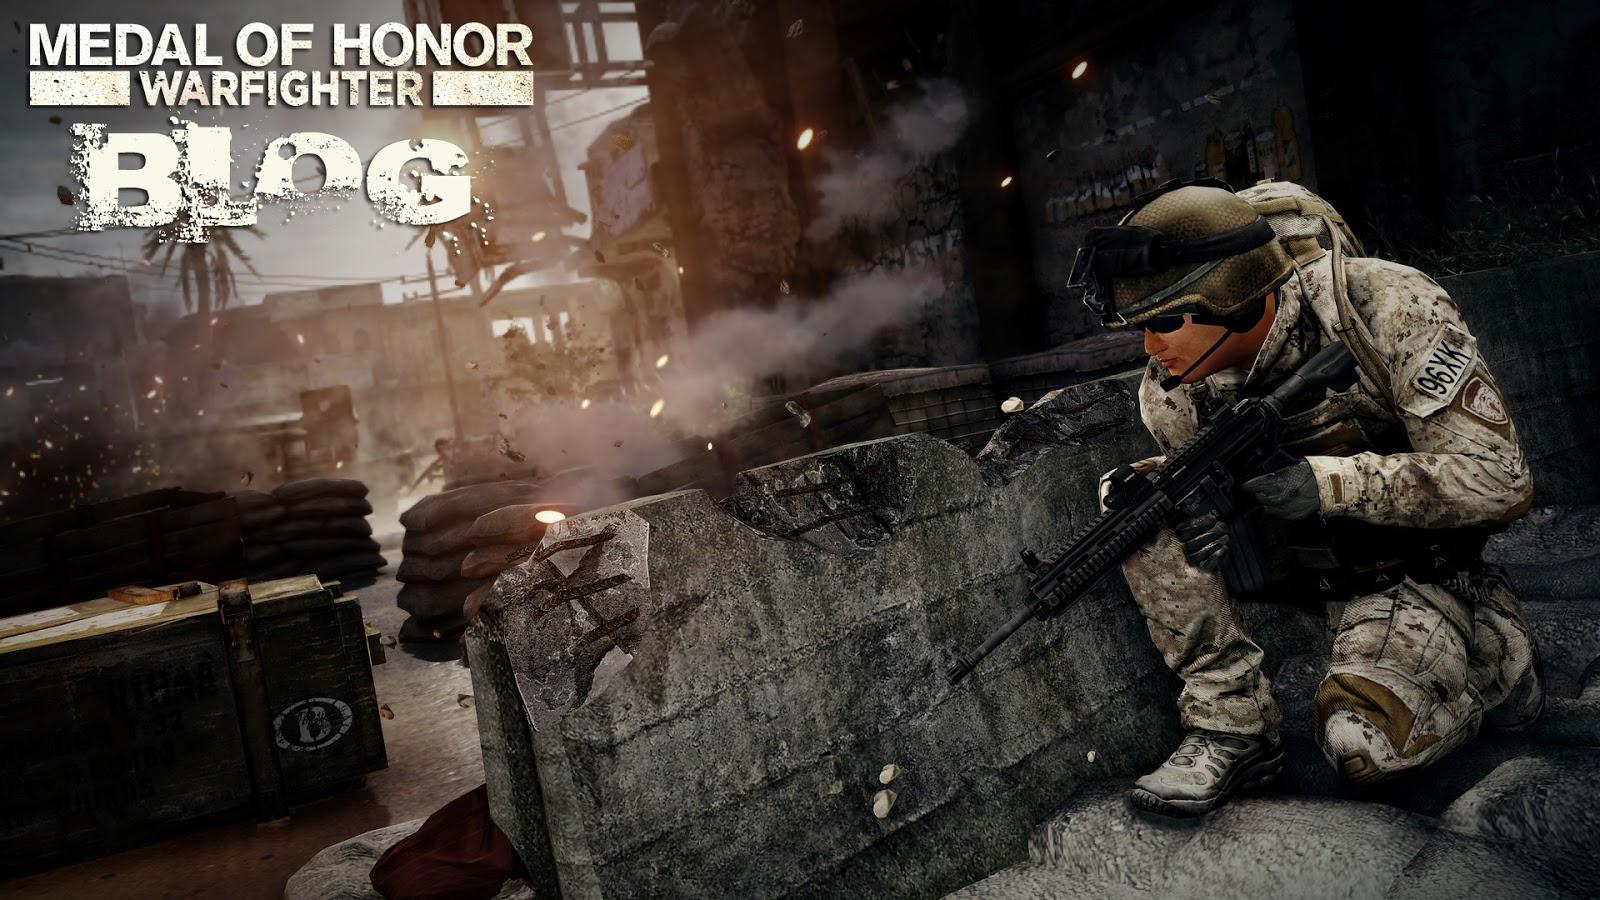 moh warfighter wallpaper hd - photo #17